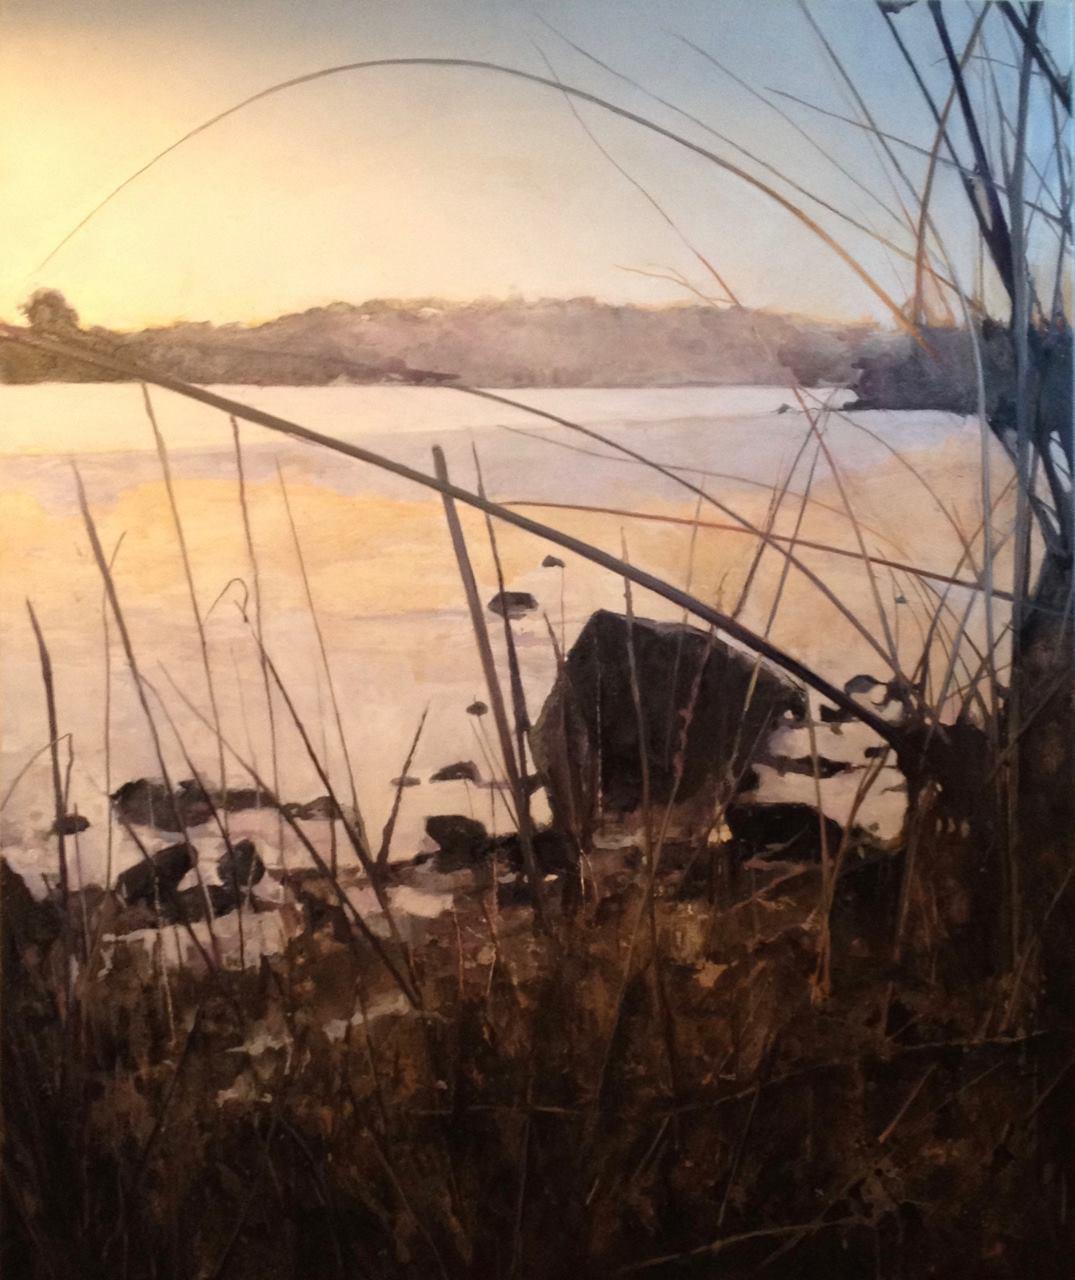 The Elegance of Nature: Lee Wilder Snider Retrospective at O'Rourke Gallery